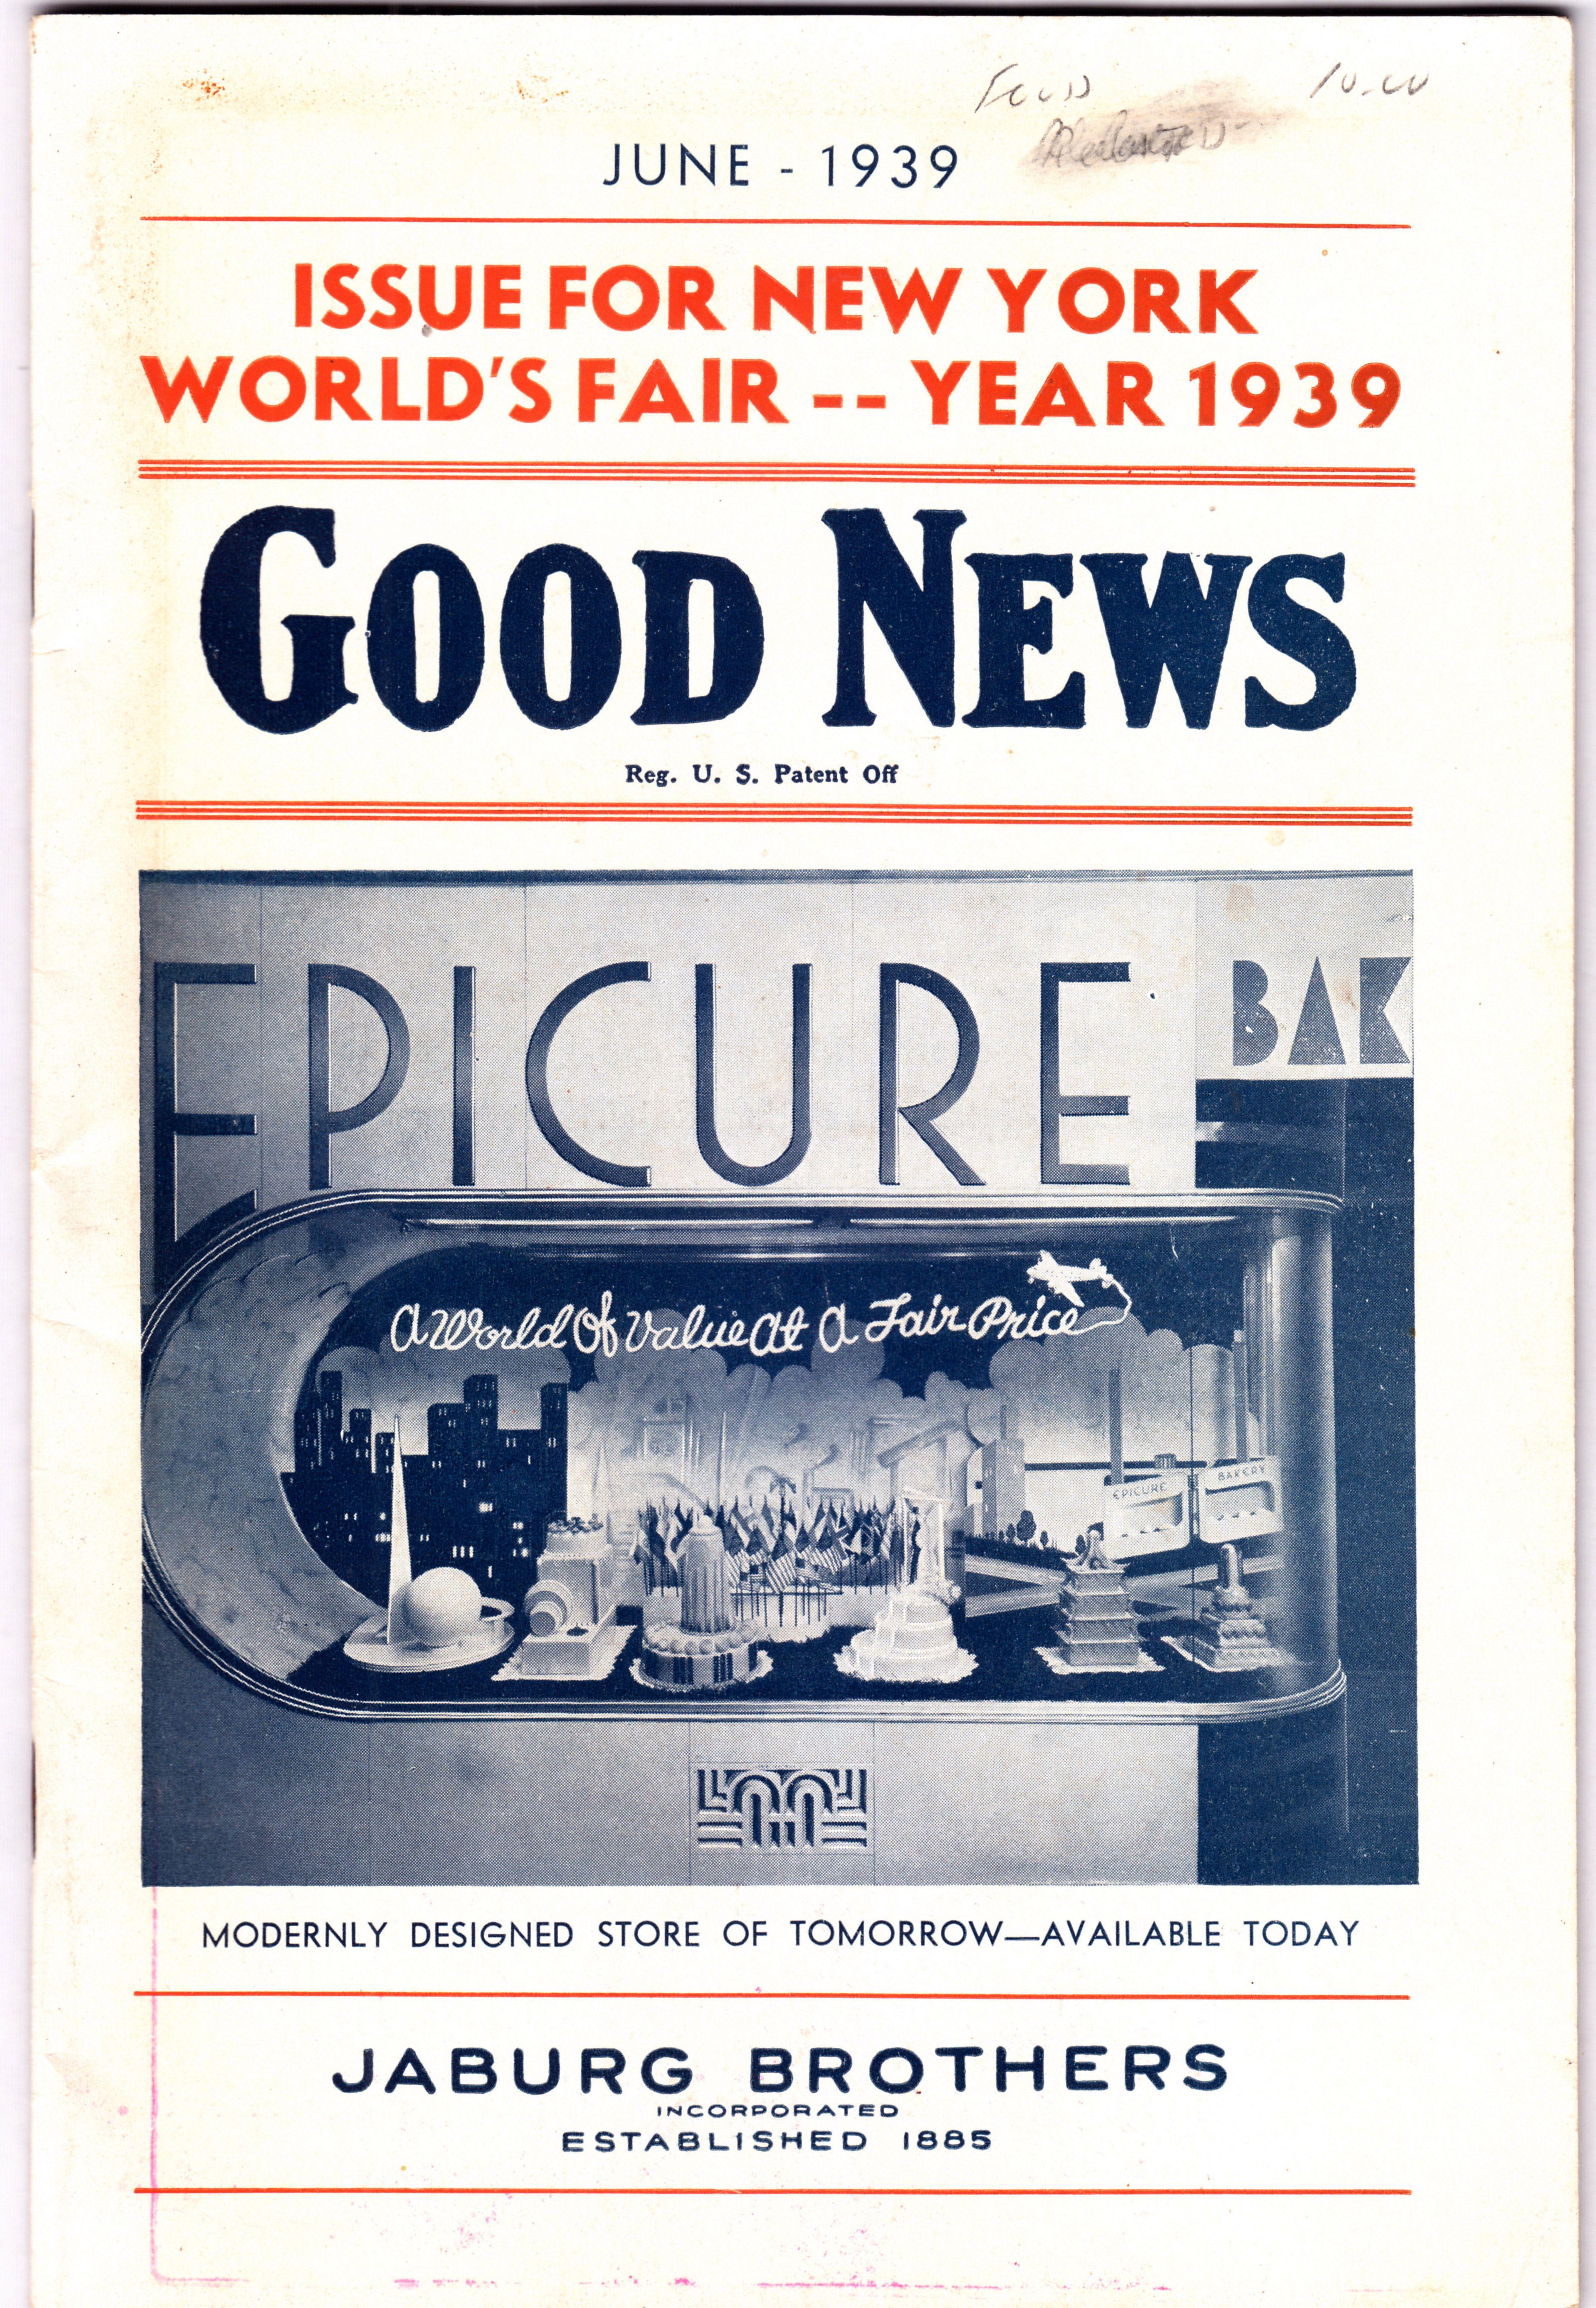 1939 New York World's Fair Good News Magazine